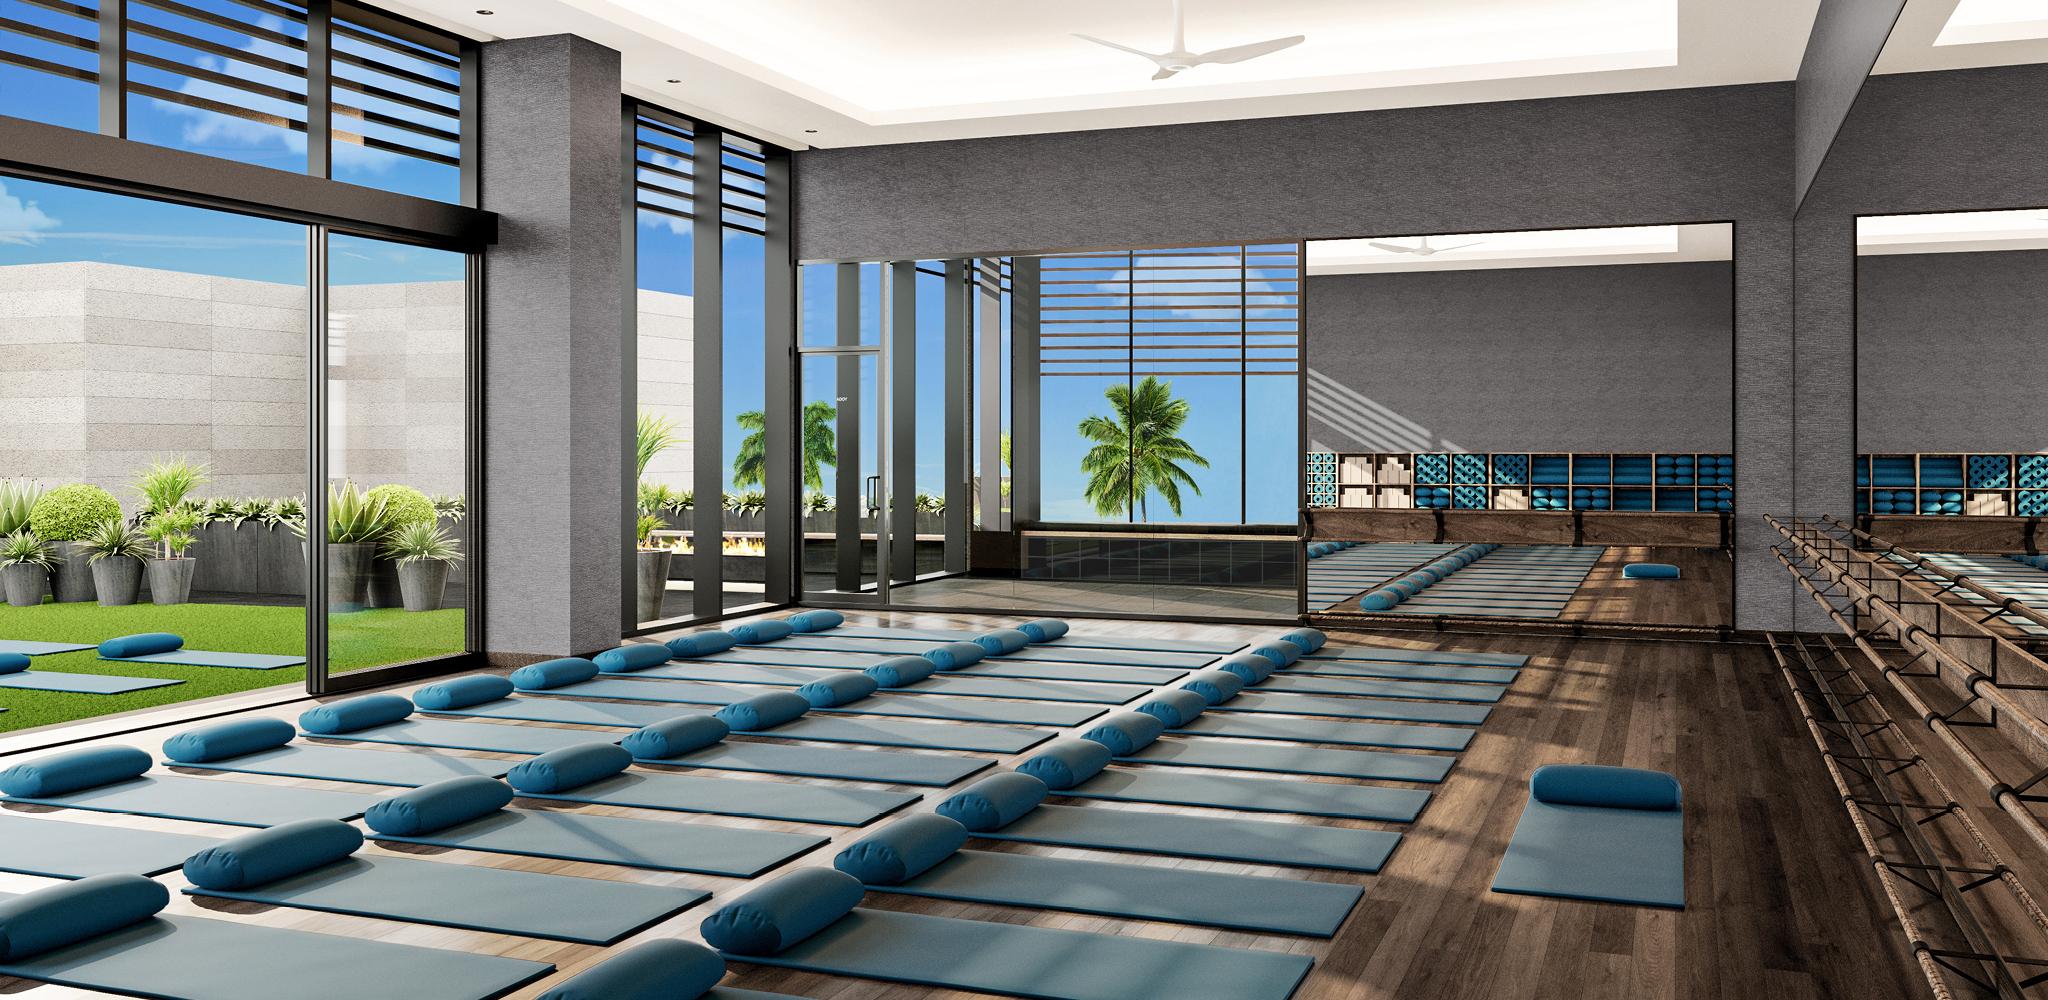 Century City Yoga